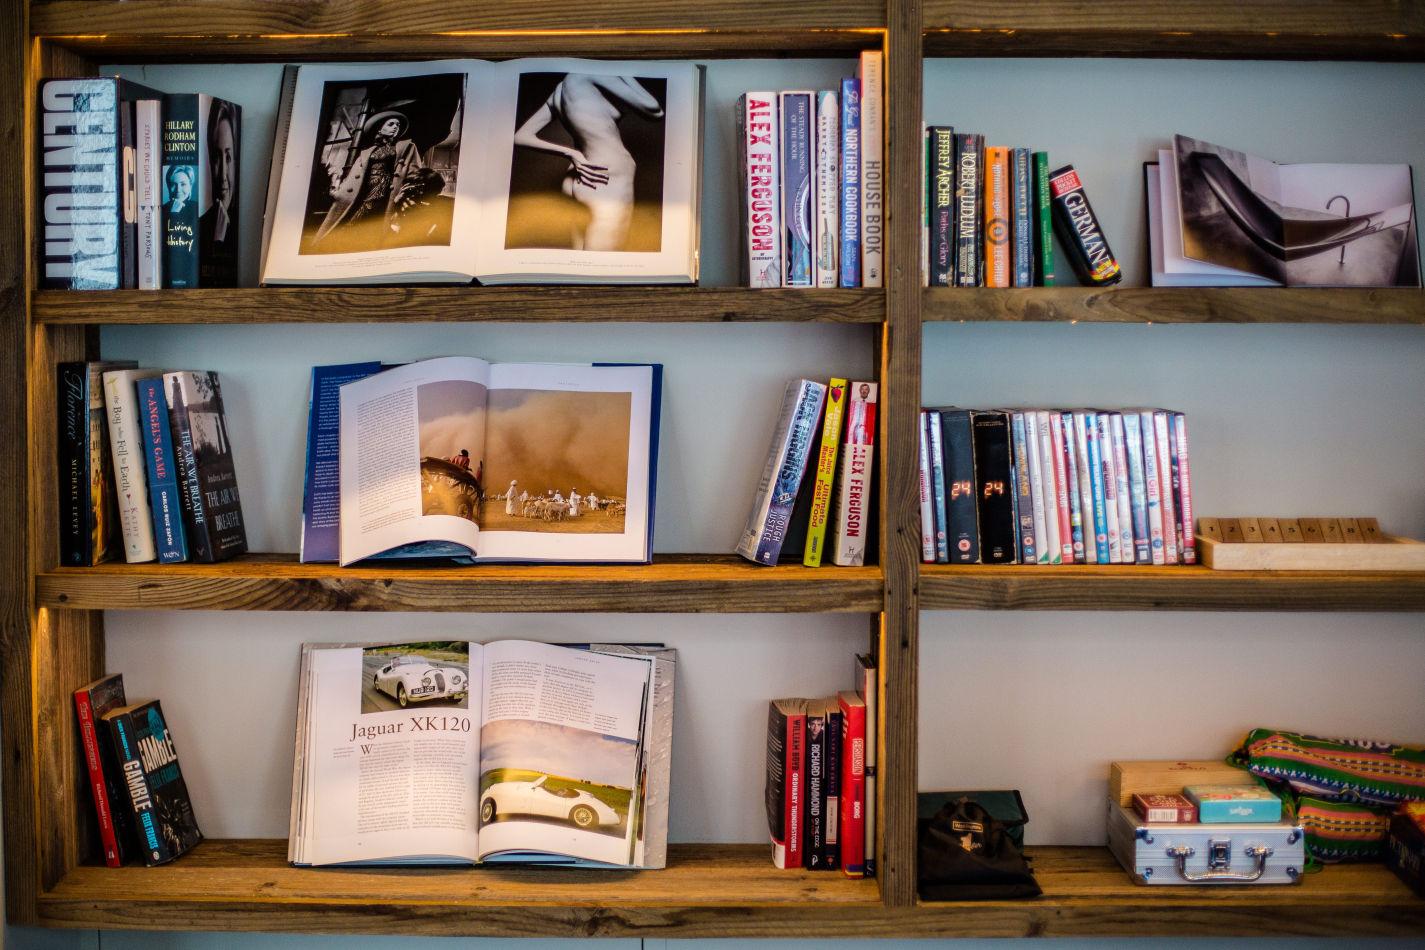 montfort-bookshelf-2